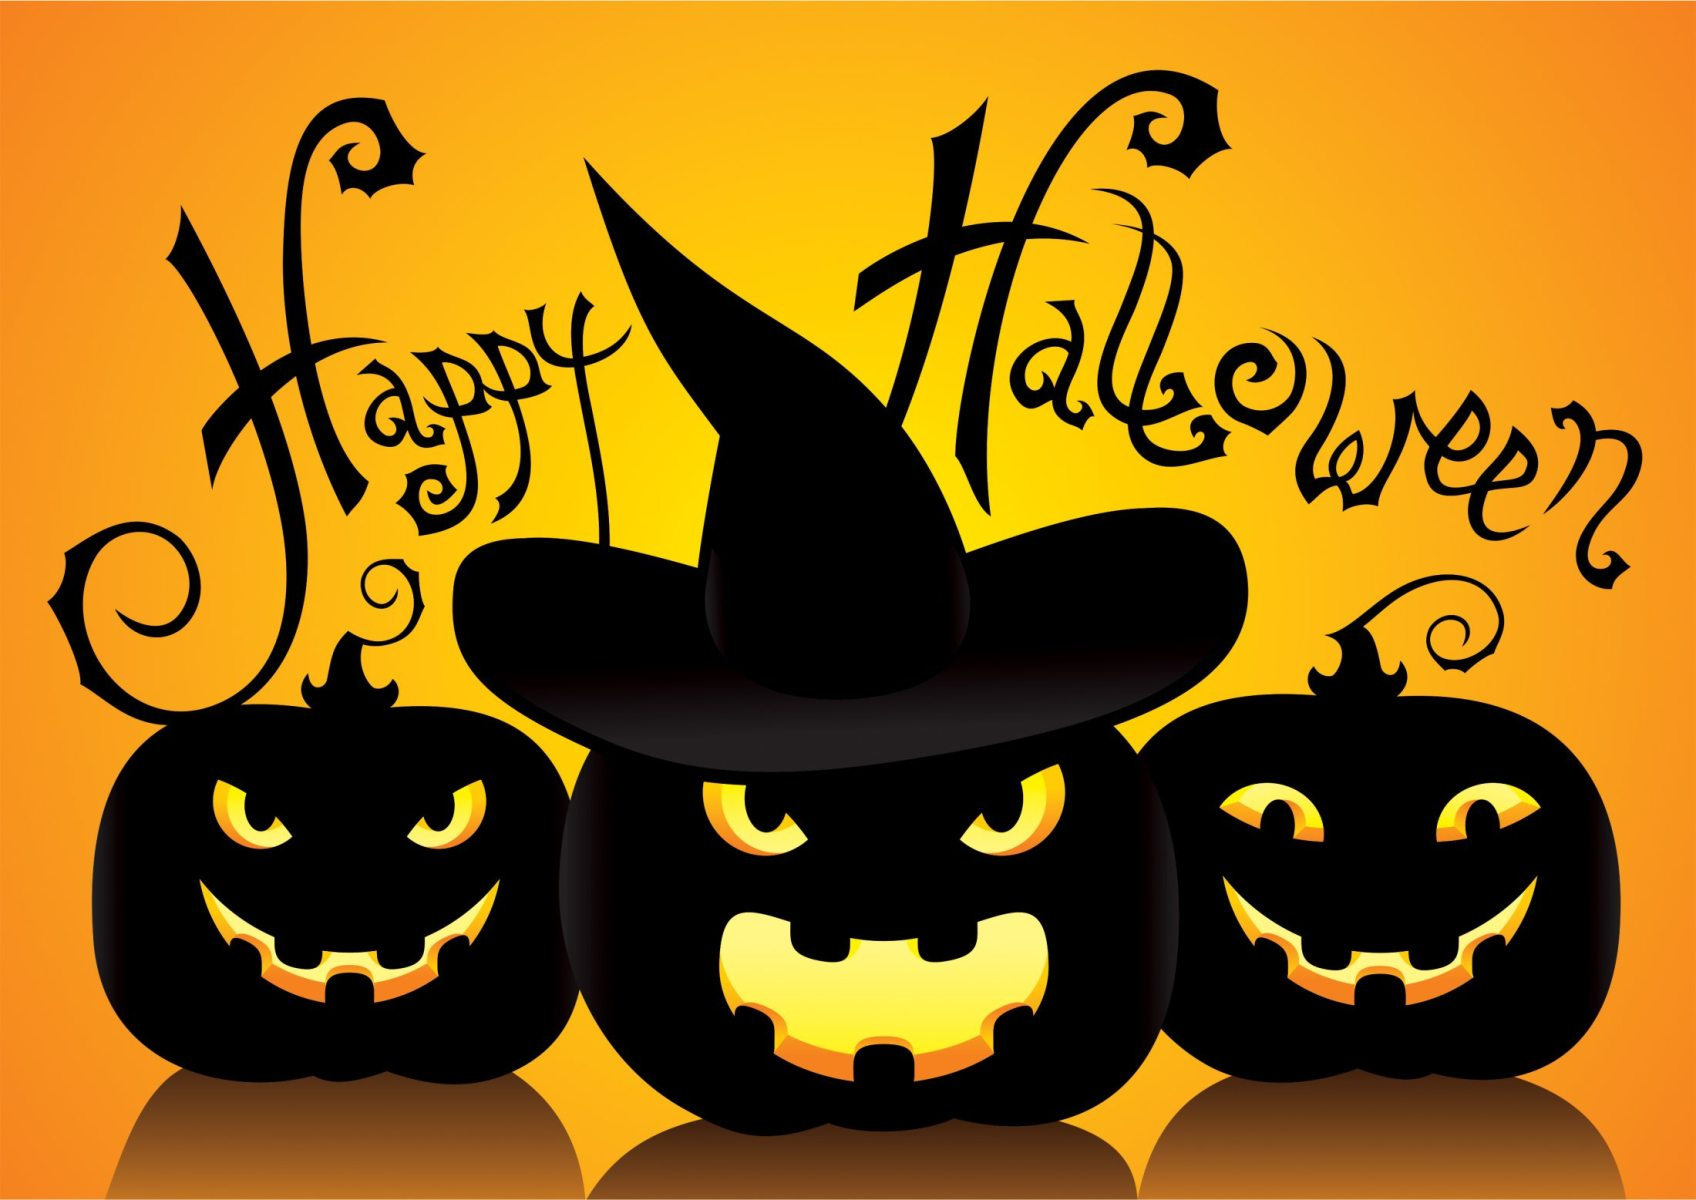 Halloween Safe Trick or Treat 2014